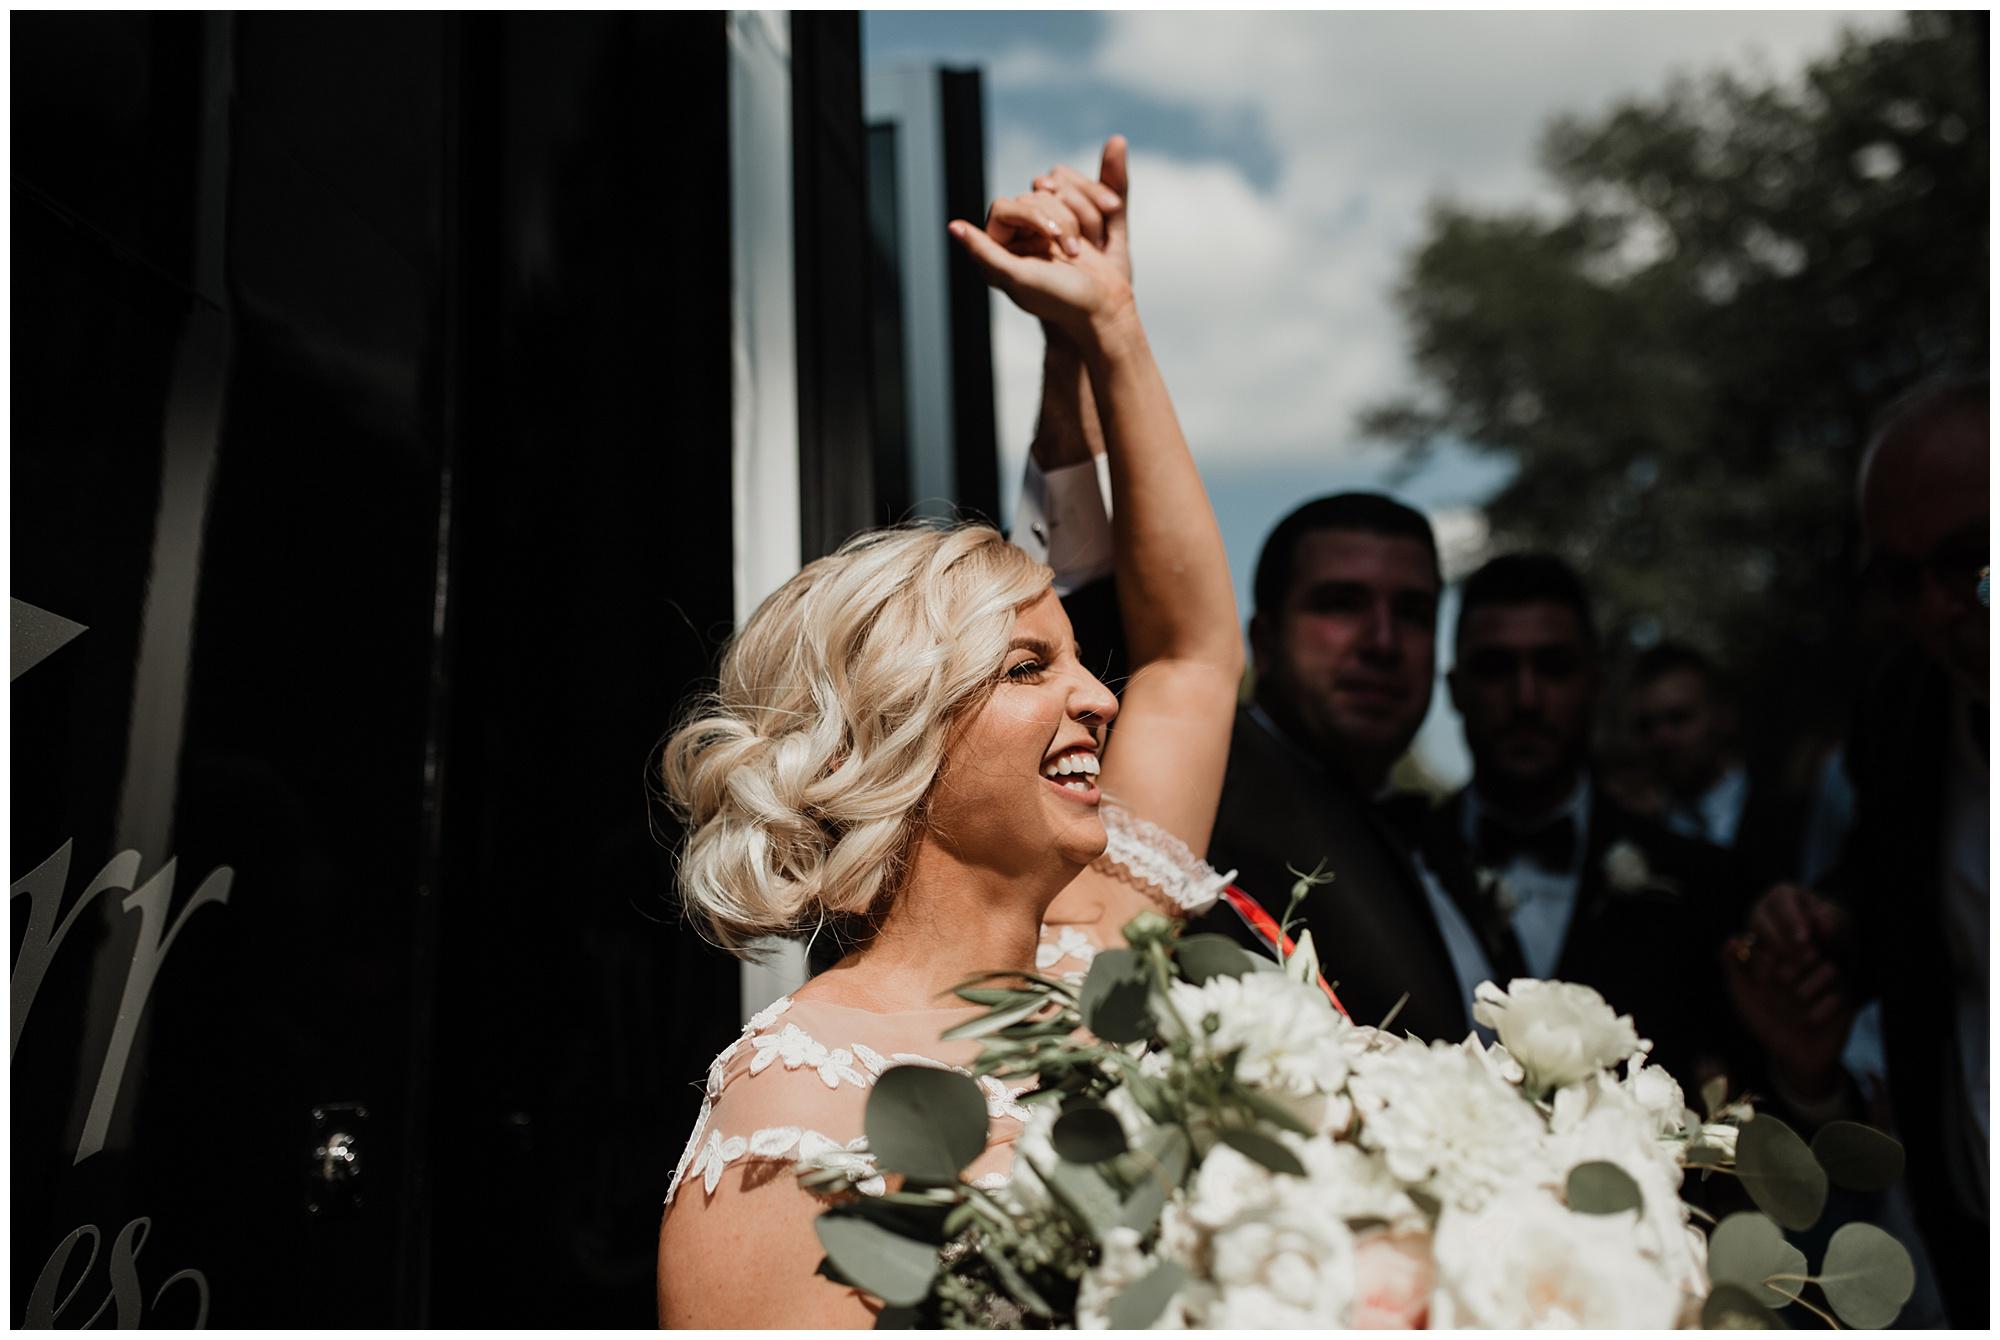 pear_tree_estate_wedding_champaign_il_wright_photographs_jj_0067.jpg